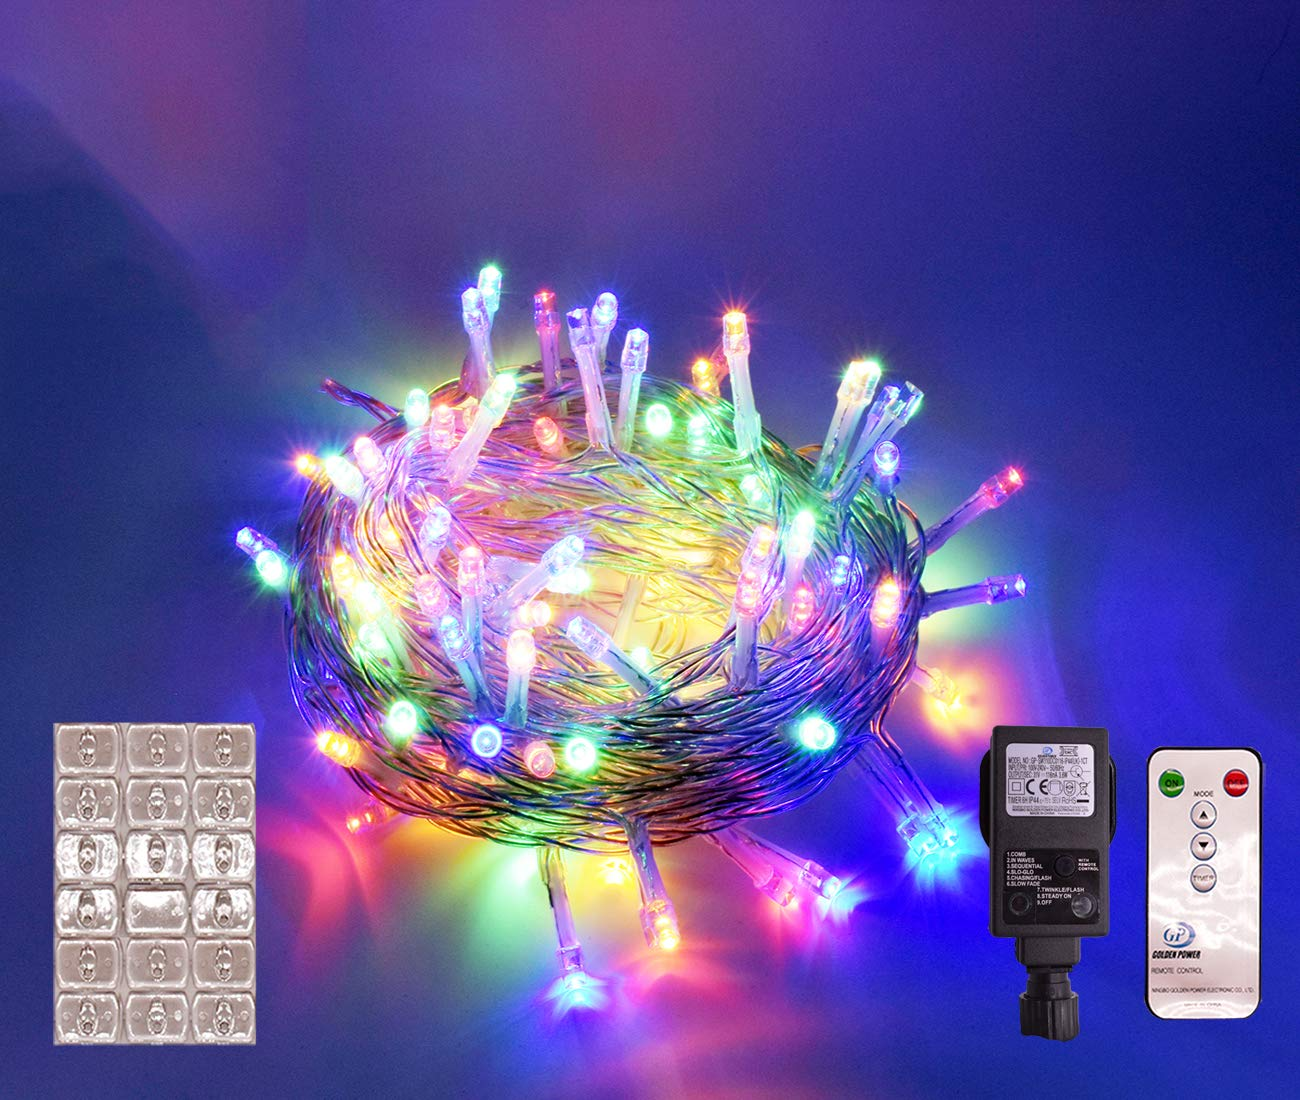 Cusomik 200LED 75ft Indoor String Christmas Lights 31V 8 Modes Fairy String for Homes, Christmas Tree, Wedding Party, Bedroom, Indoor Wall Decoration (200LED, Multicolor) DAG004K